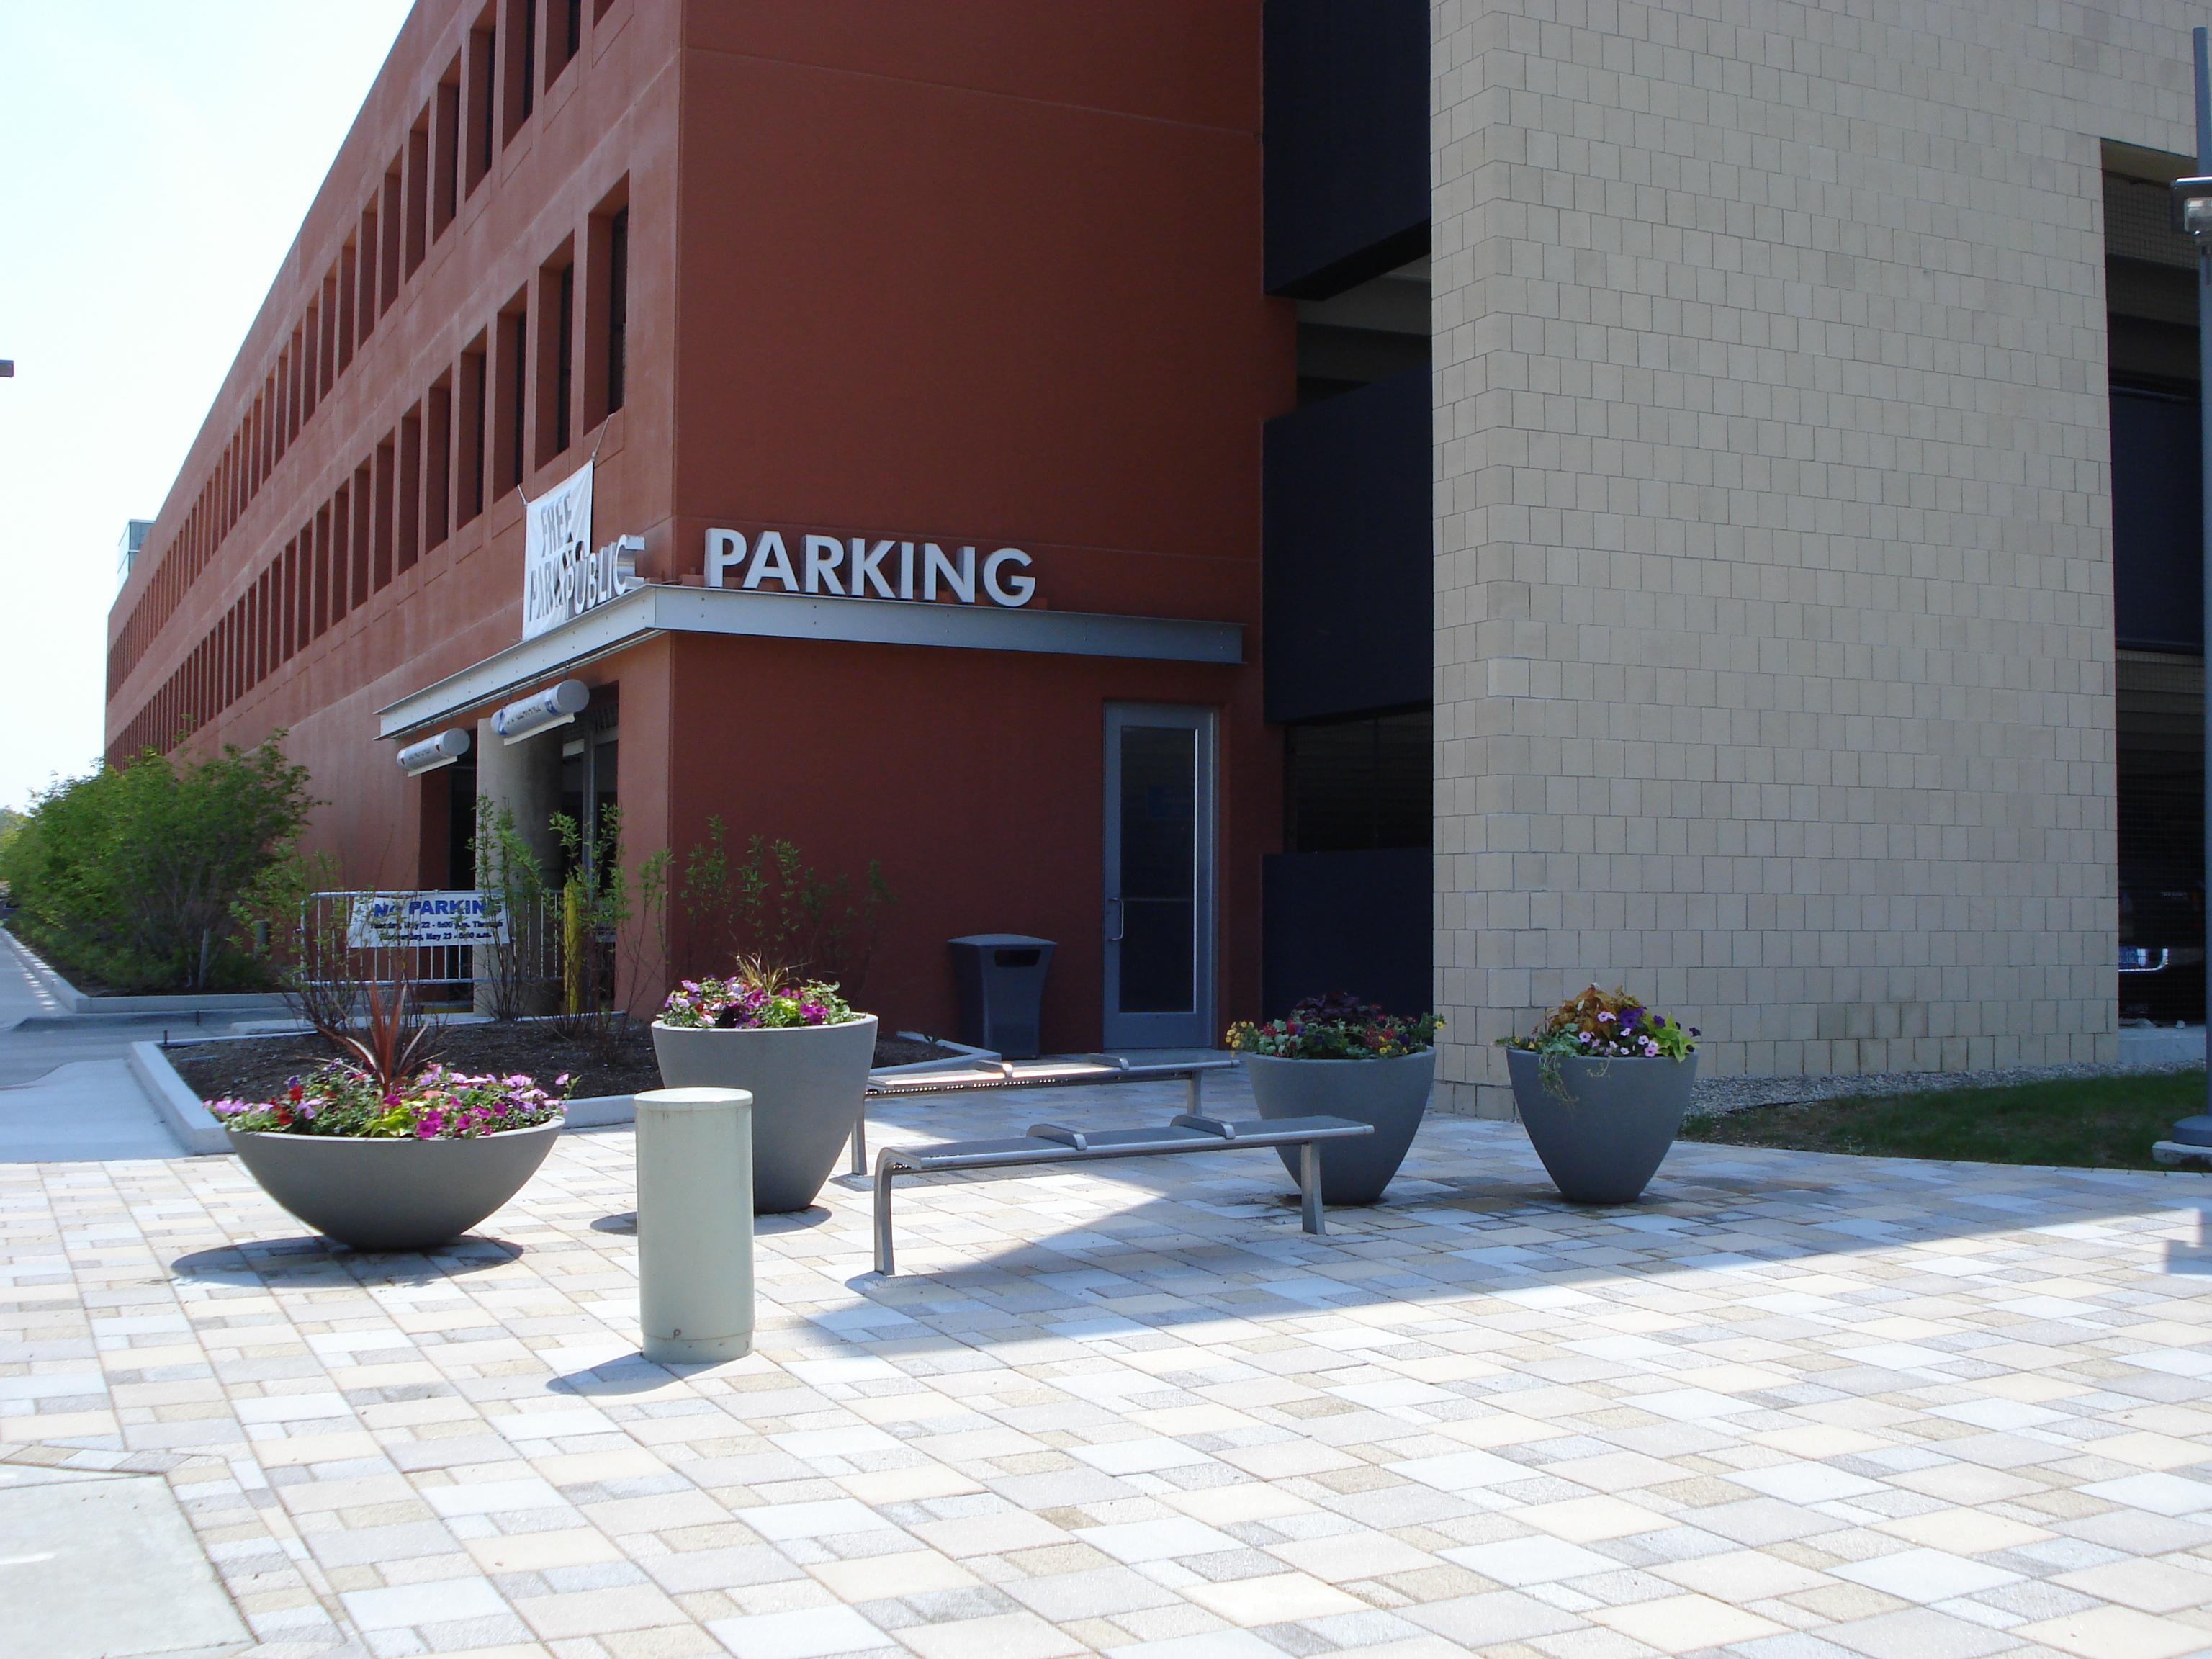 Parking, parking structure, parking garage, parking design, architecture, engineer, planning, parking consultant